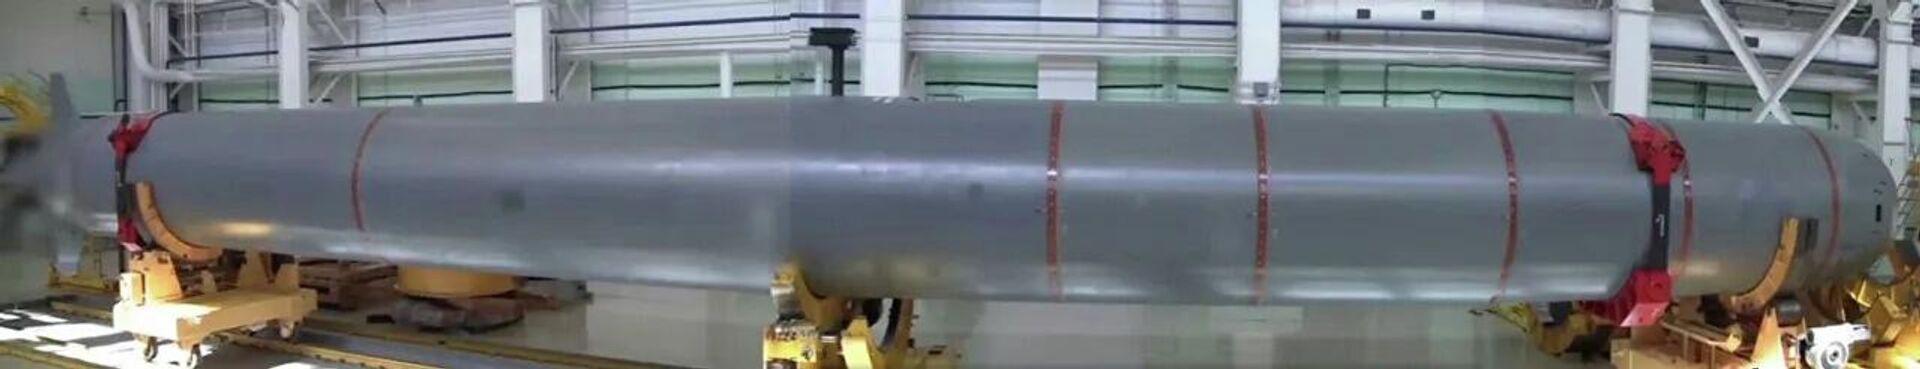 Подводный аппарат Посейдон  - Sputnik Latvija, 1920, 07.10.2021